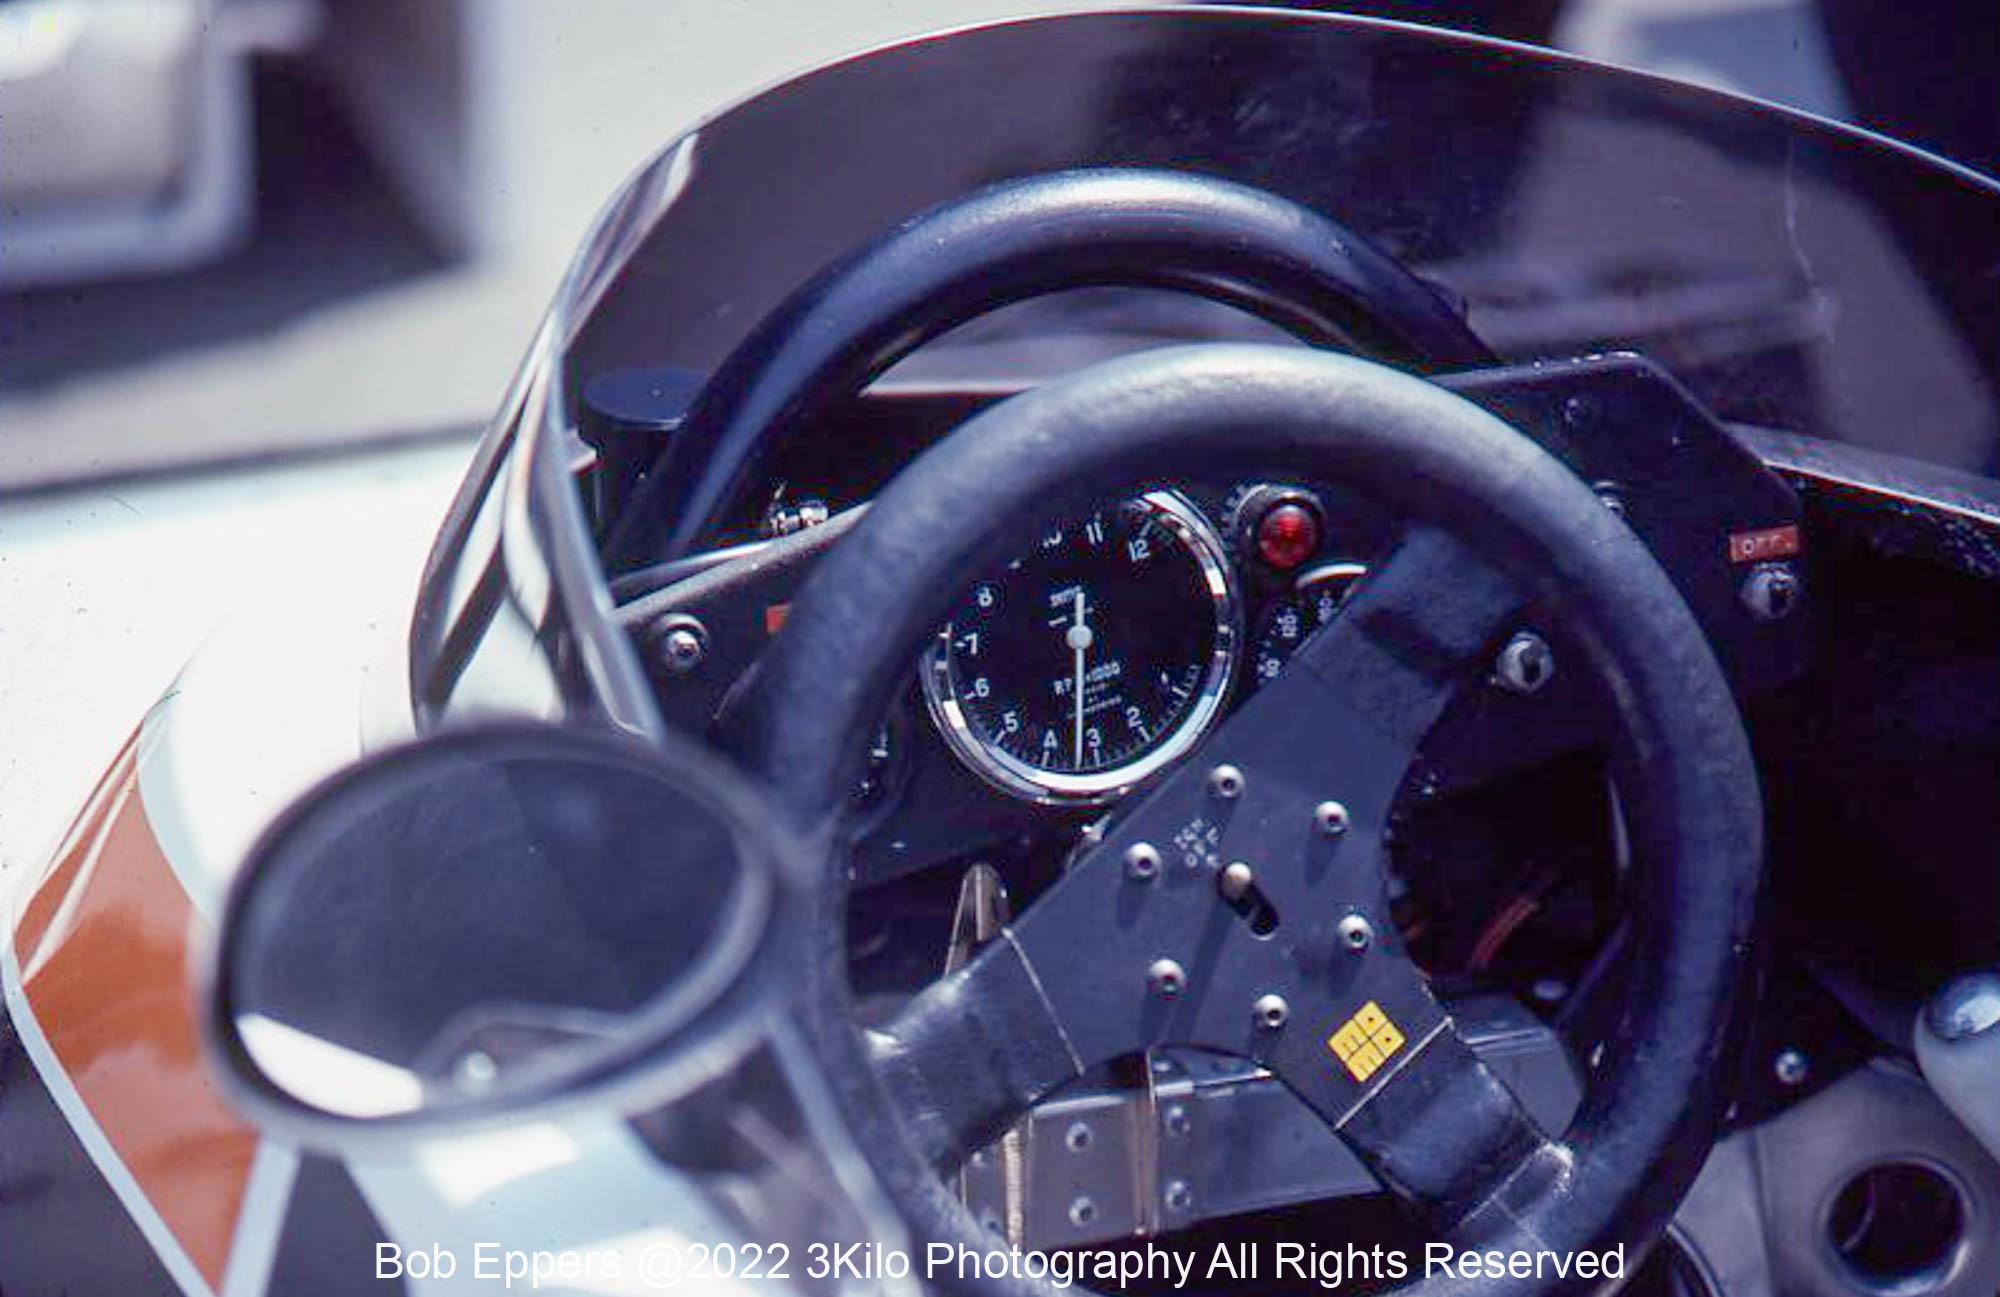 Photo of F1 Surtees cockpit. 1977 F1 LBGP